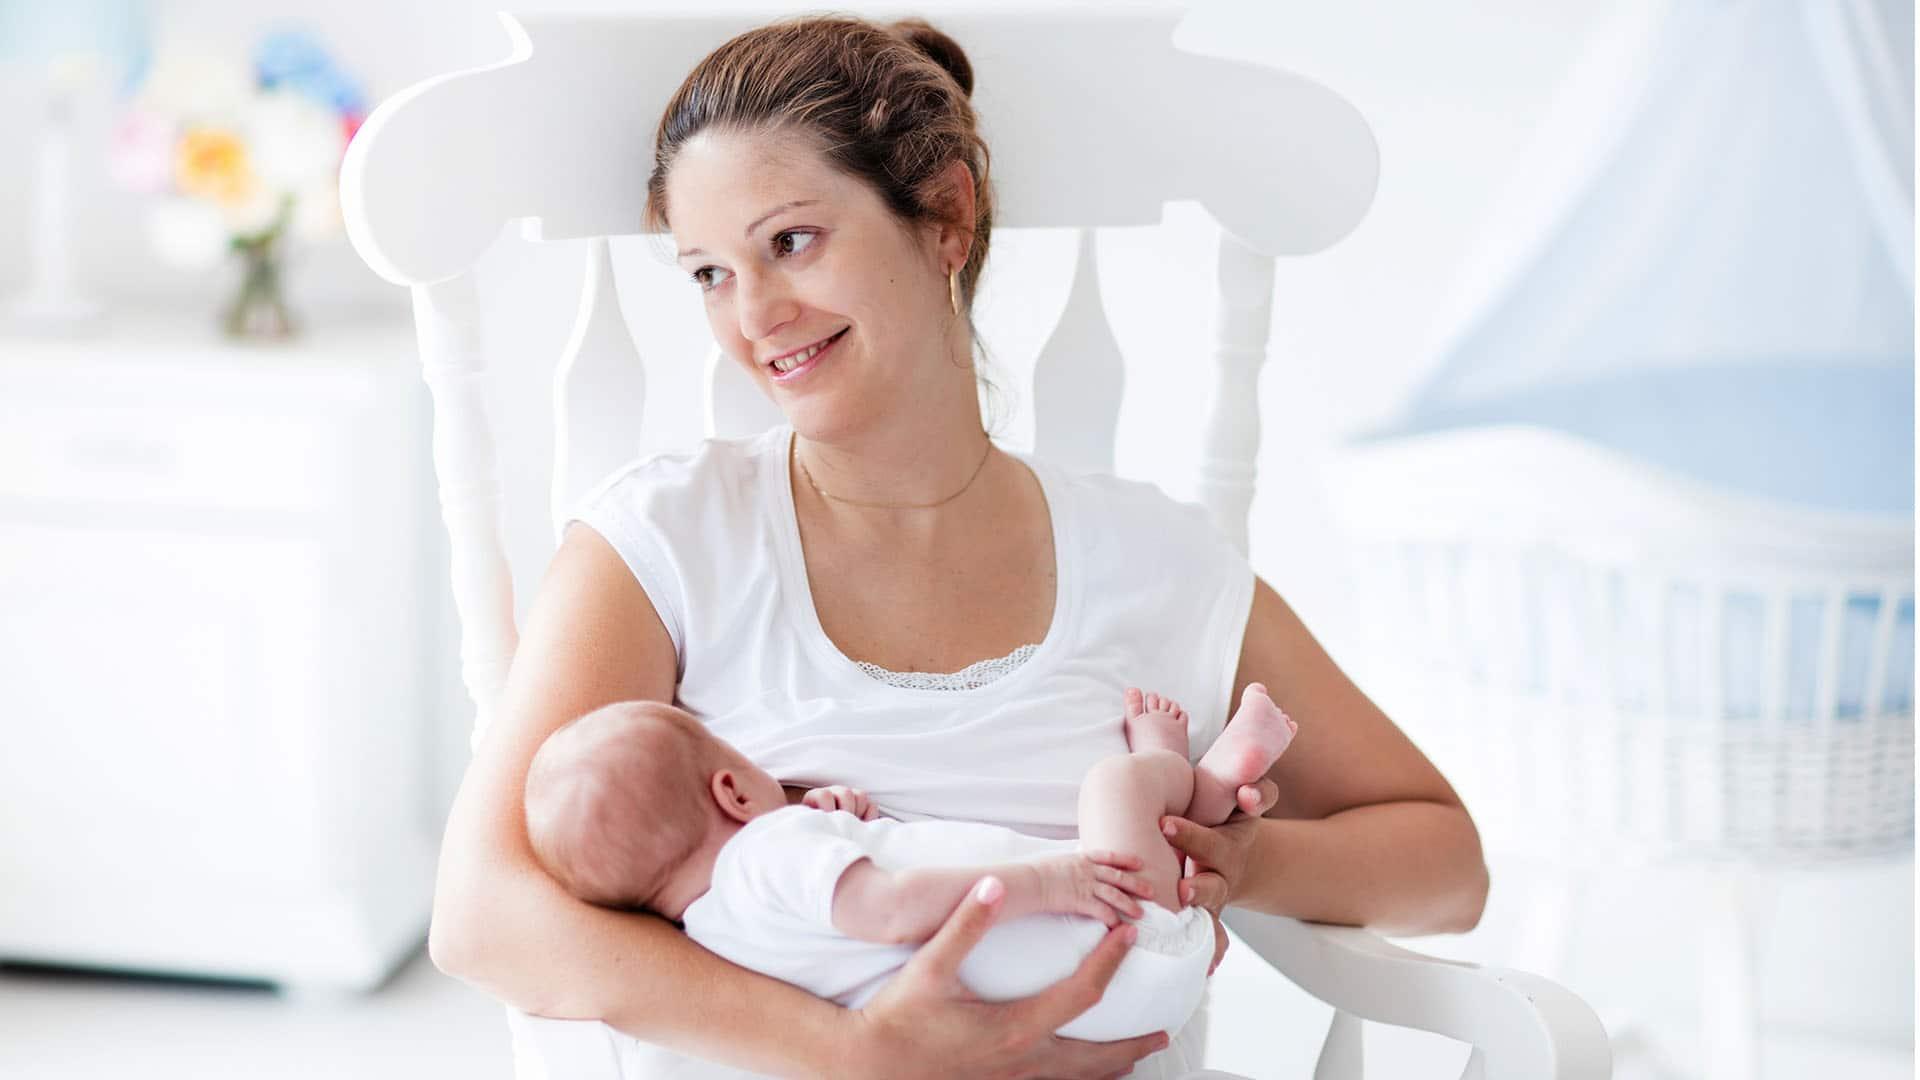 Обнаружен компонент материнского молока, способствующий когнитивному развитию ребенка